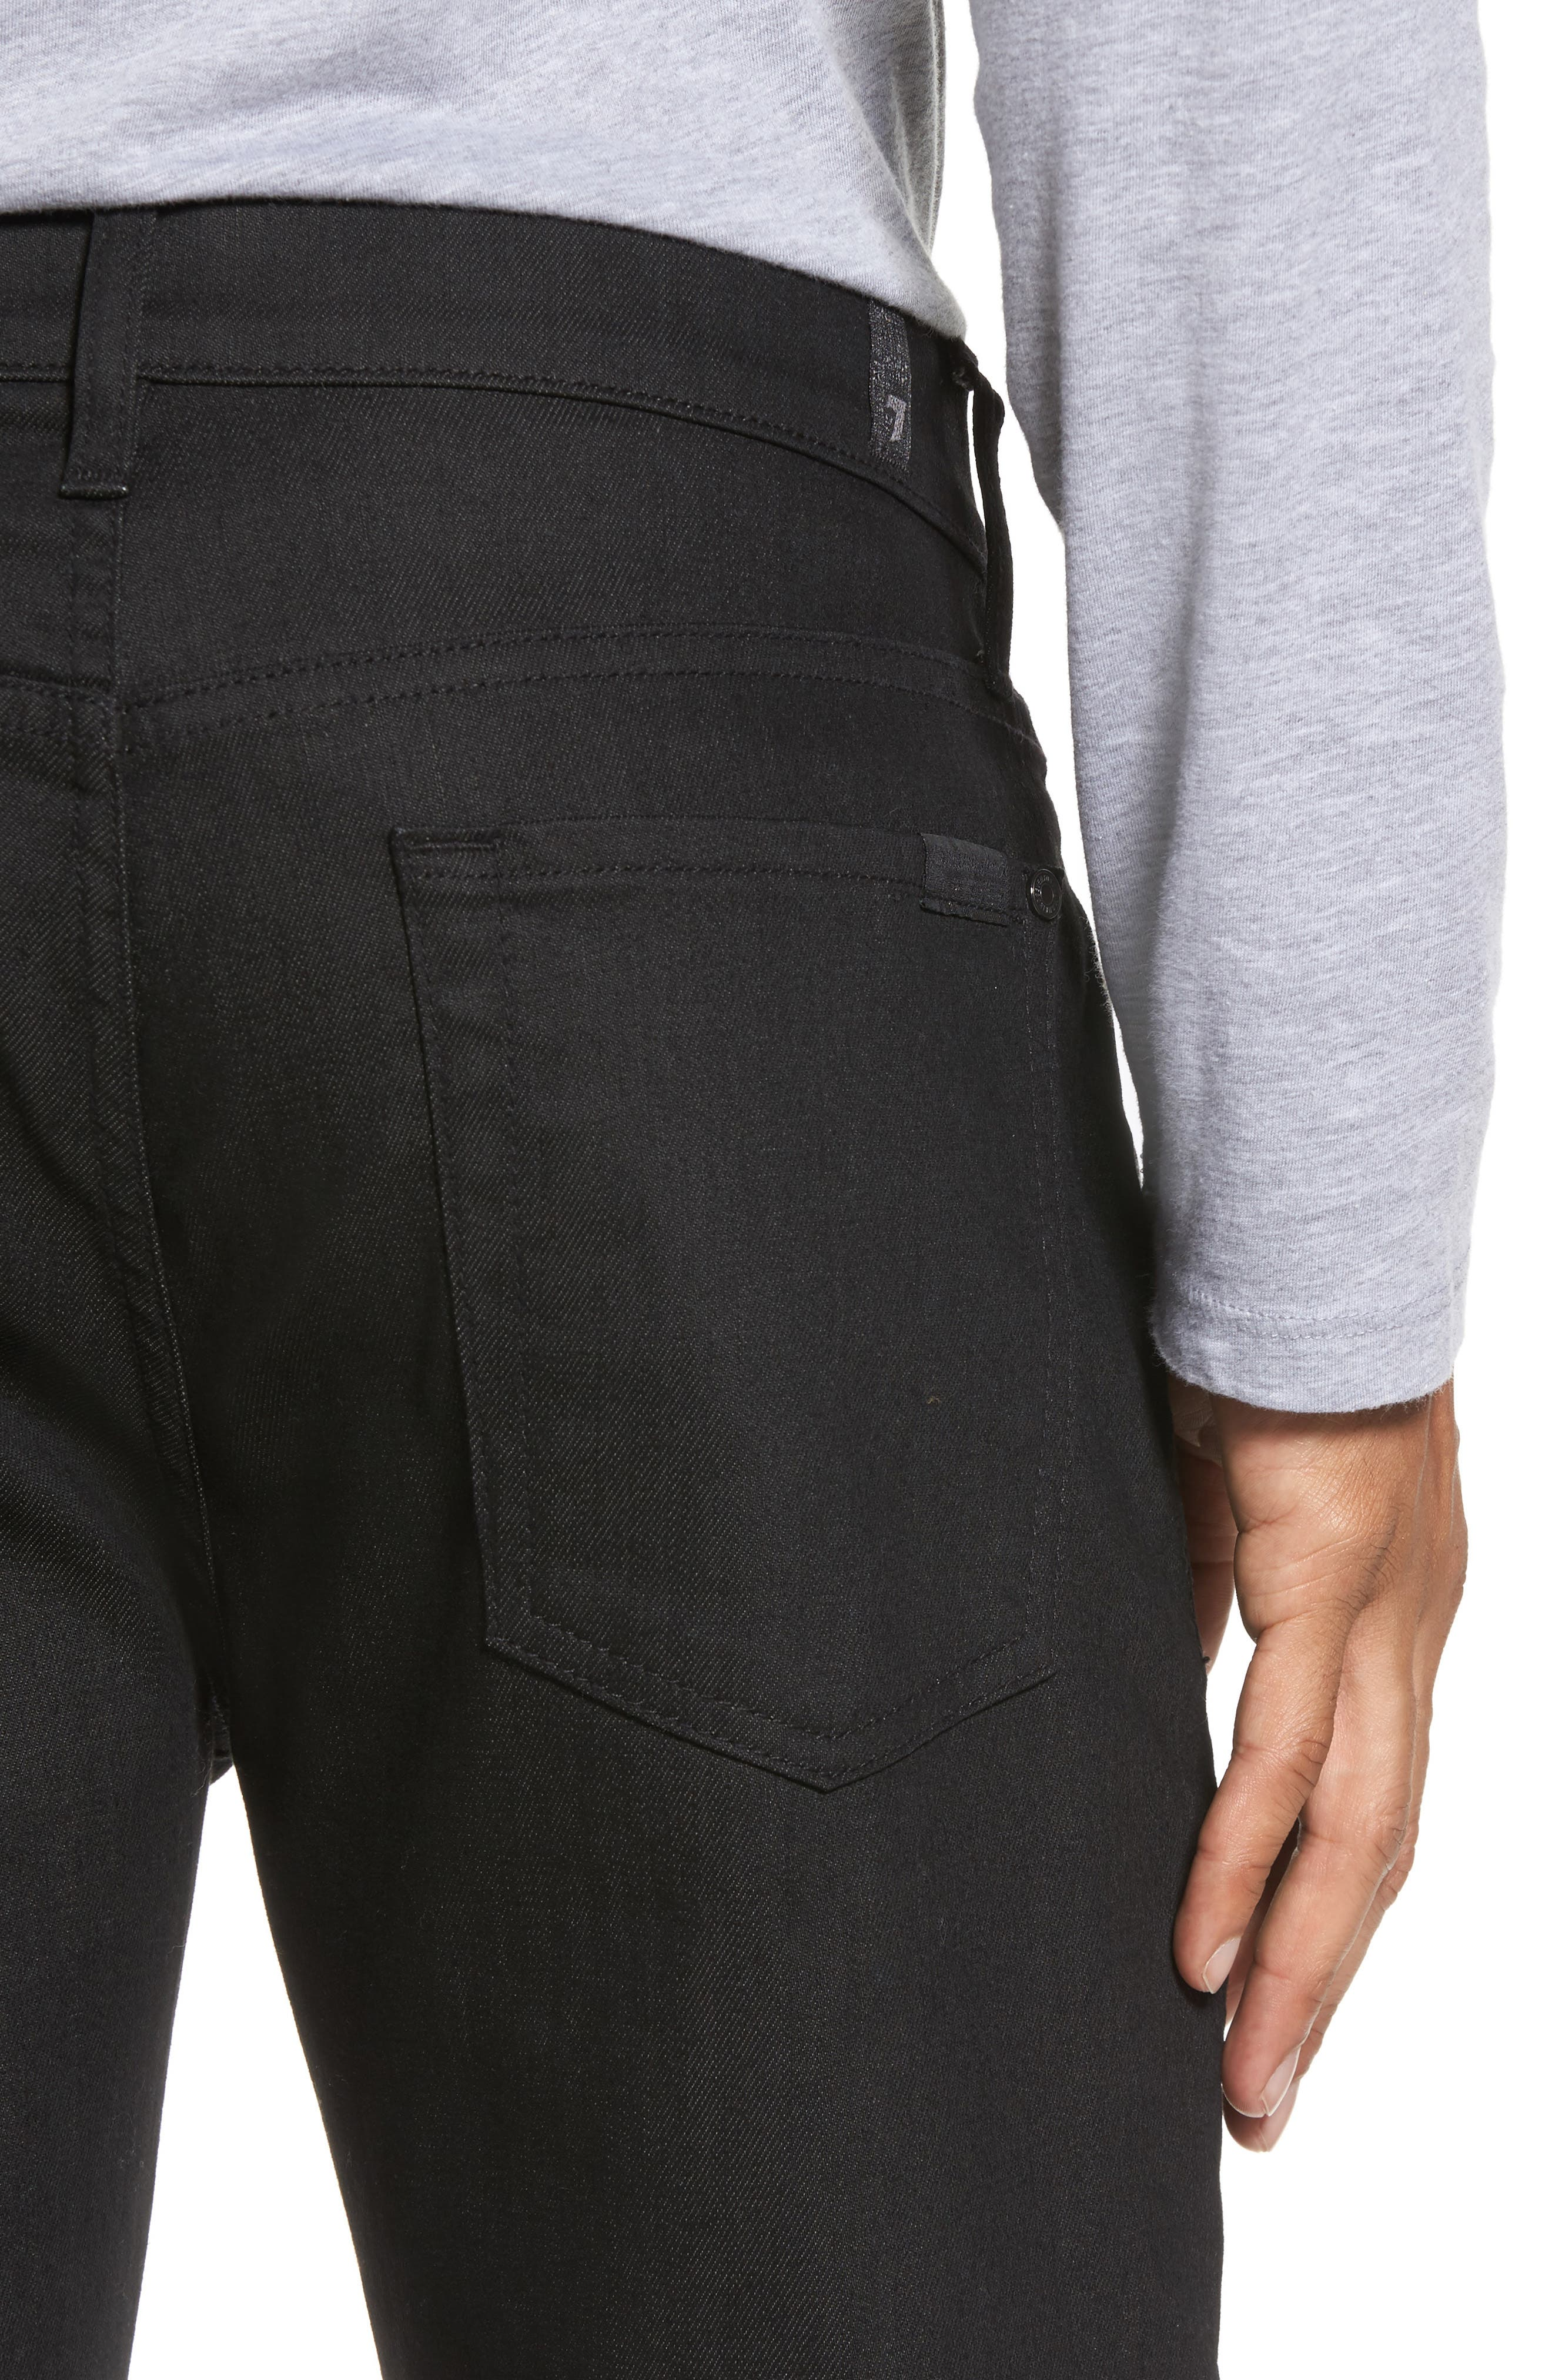 Alternate Image 4  - 7 For All Mankind® Airweft - Slimmy Slim Fit Jeans (Soiree Black)